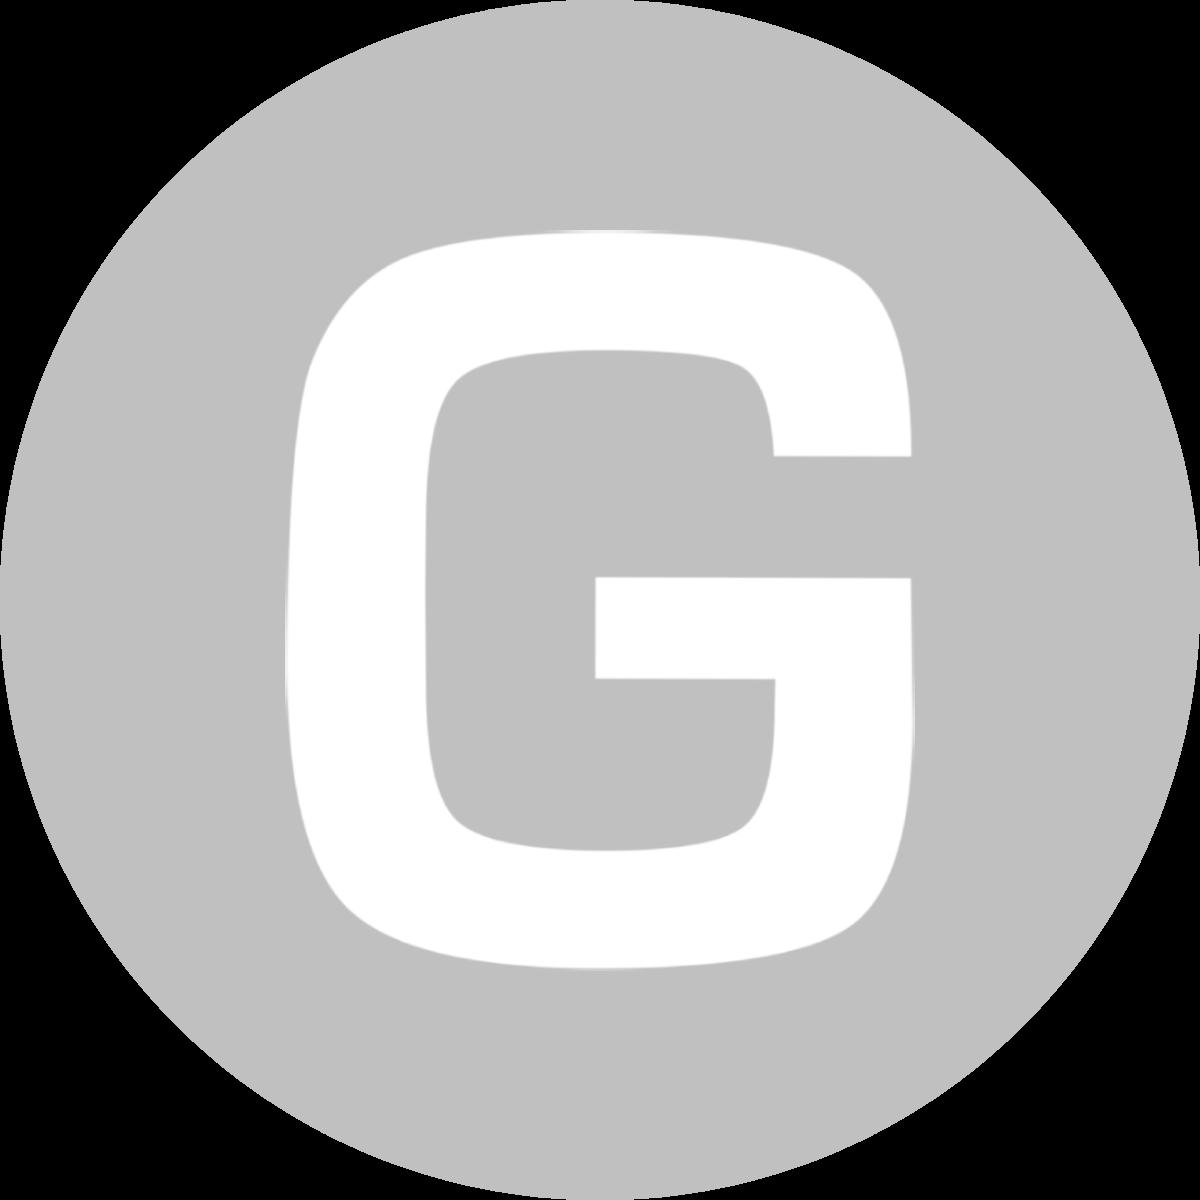 Bushnell Tour V4 JOLT laser